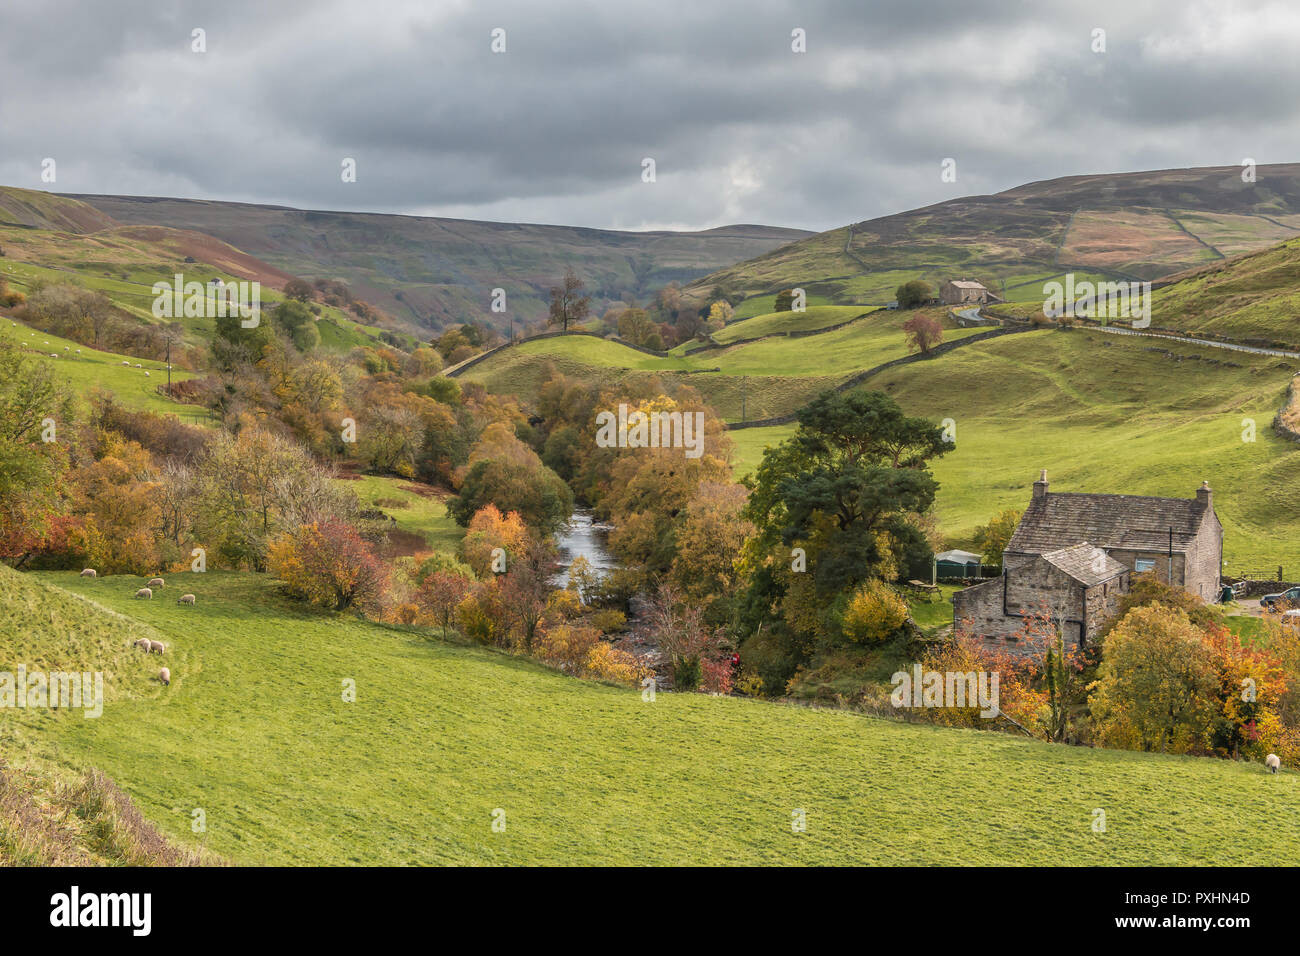 Yorkshire Dales National Park autumn landscape, Park House and River Swale, Keld, Upper Swaledale, UK Stock Photo